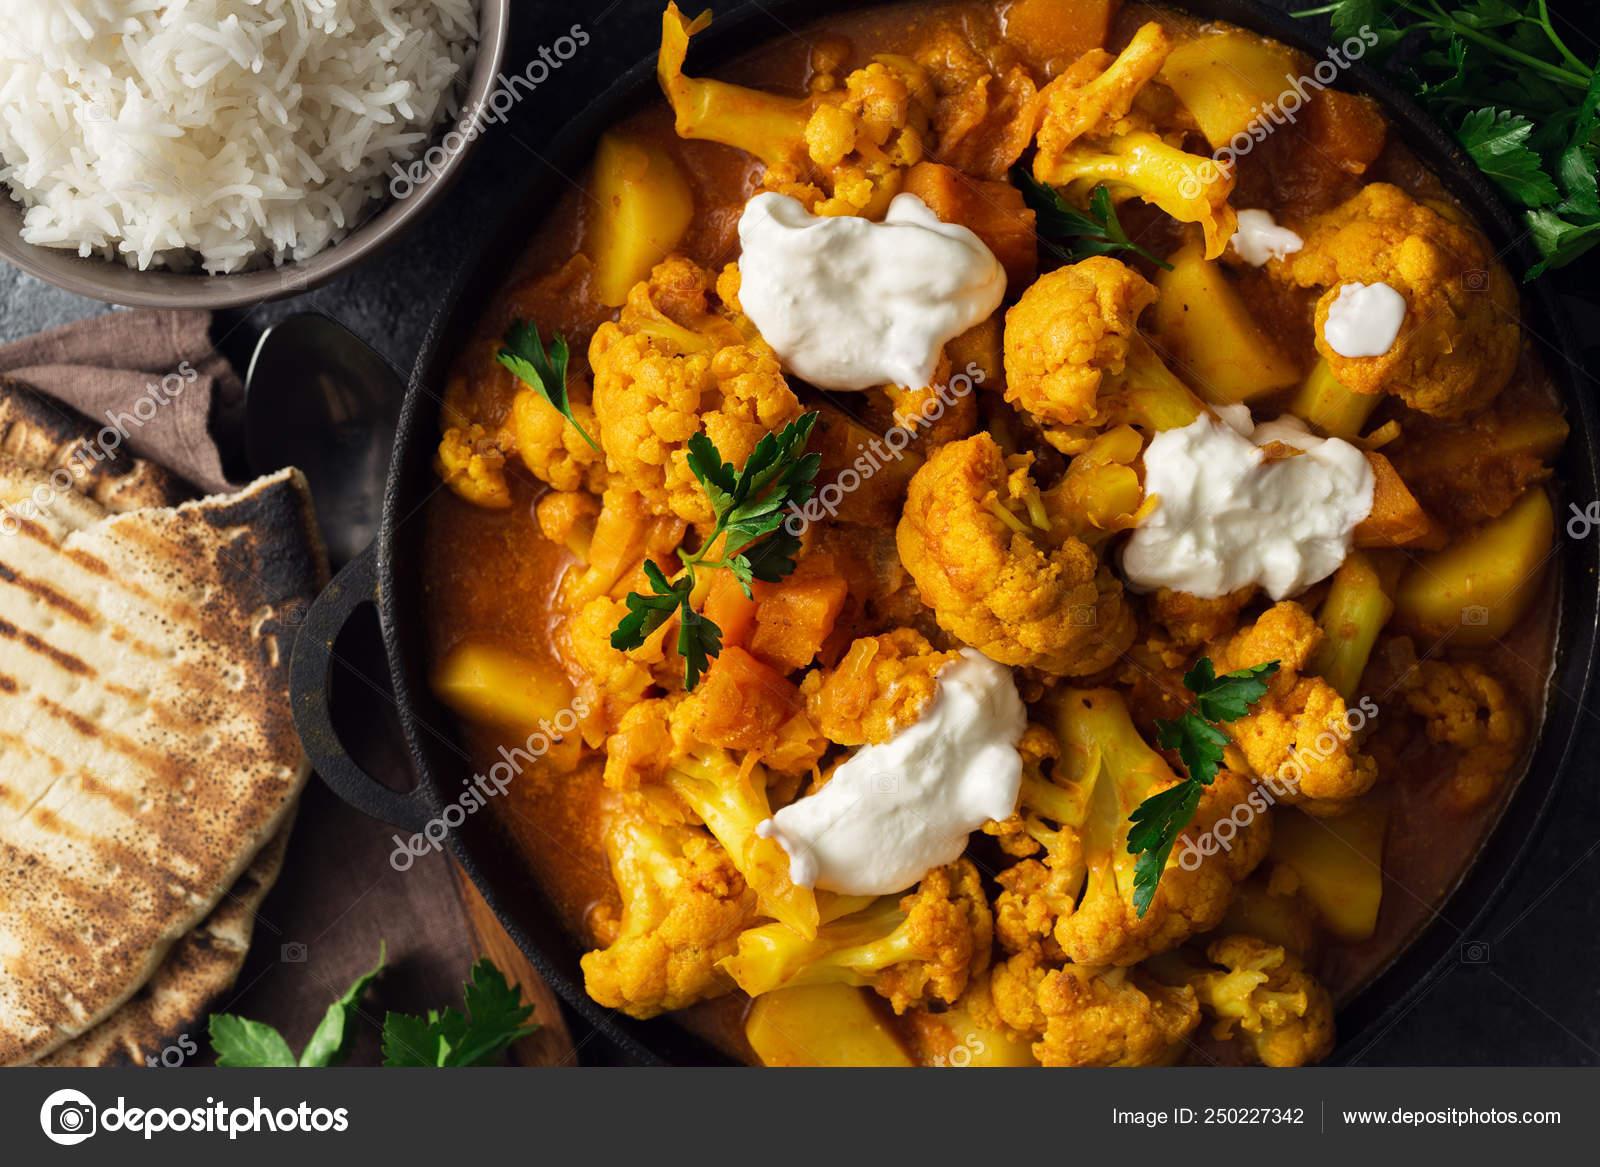 Vegetarian Indian Food Cauliflower Curry Basmati Rice Naan